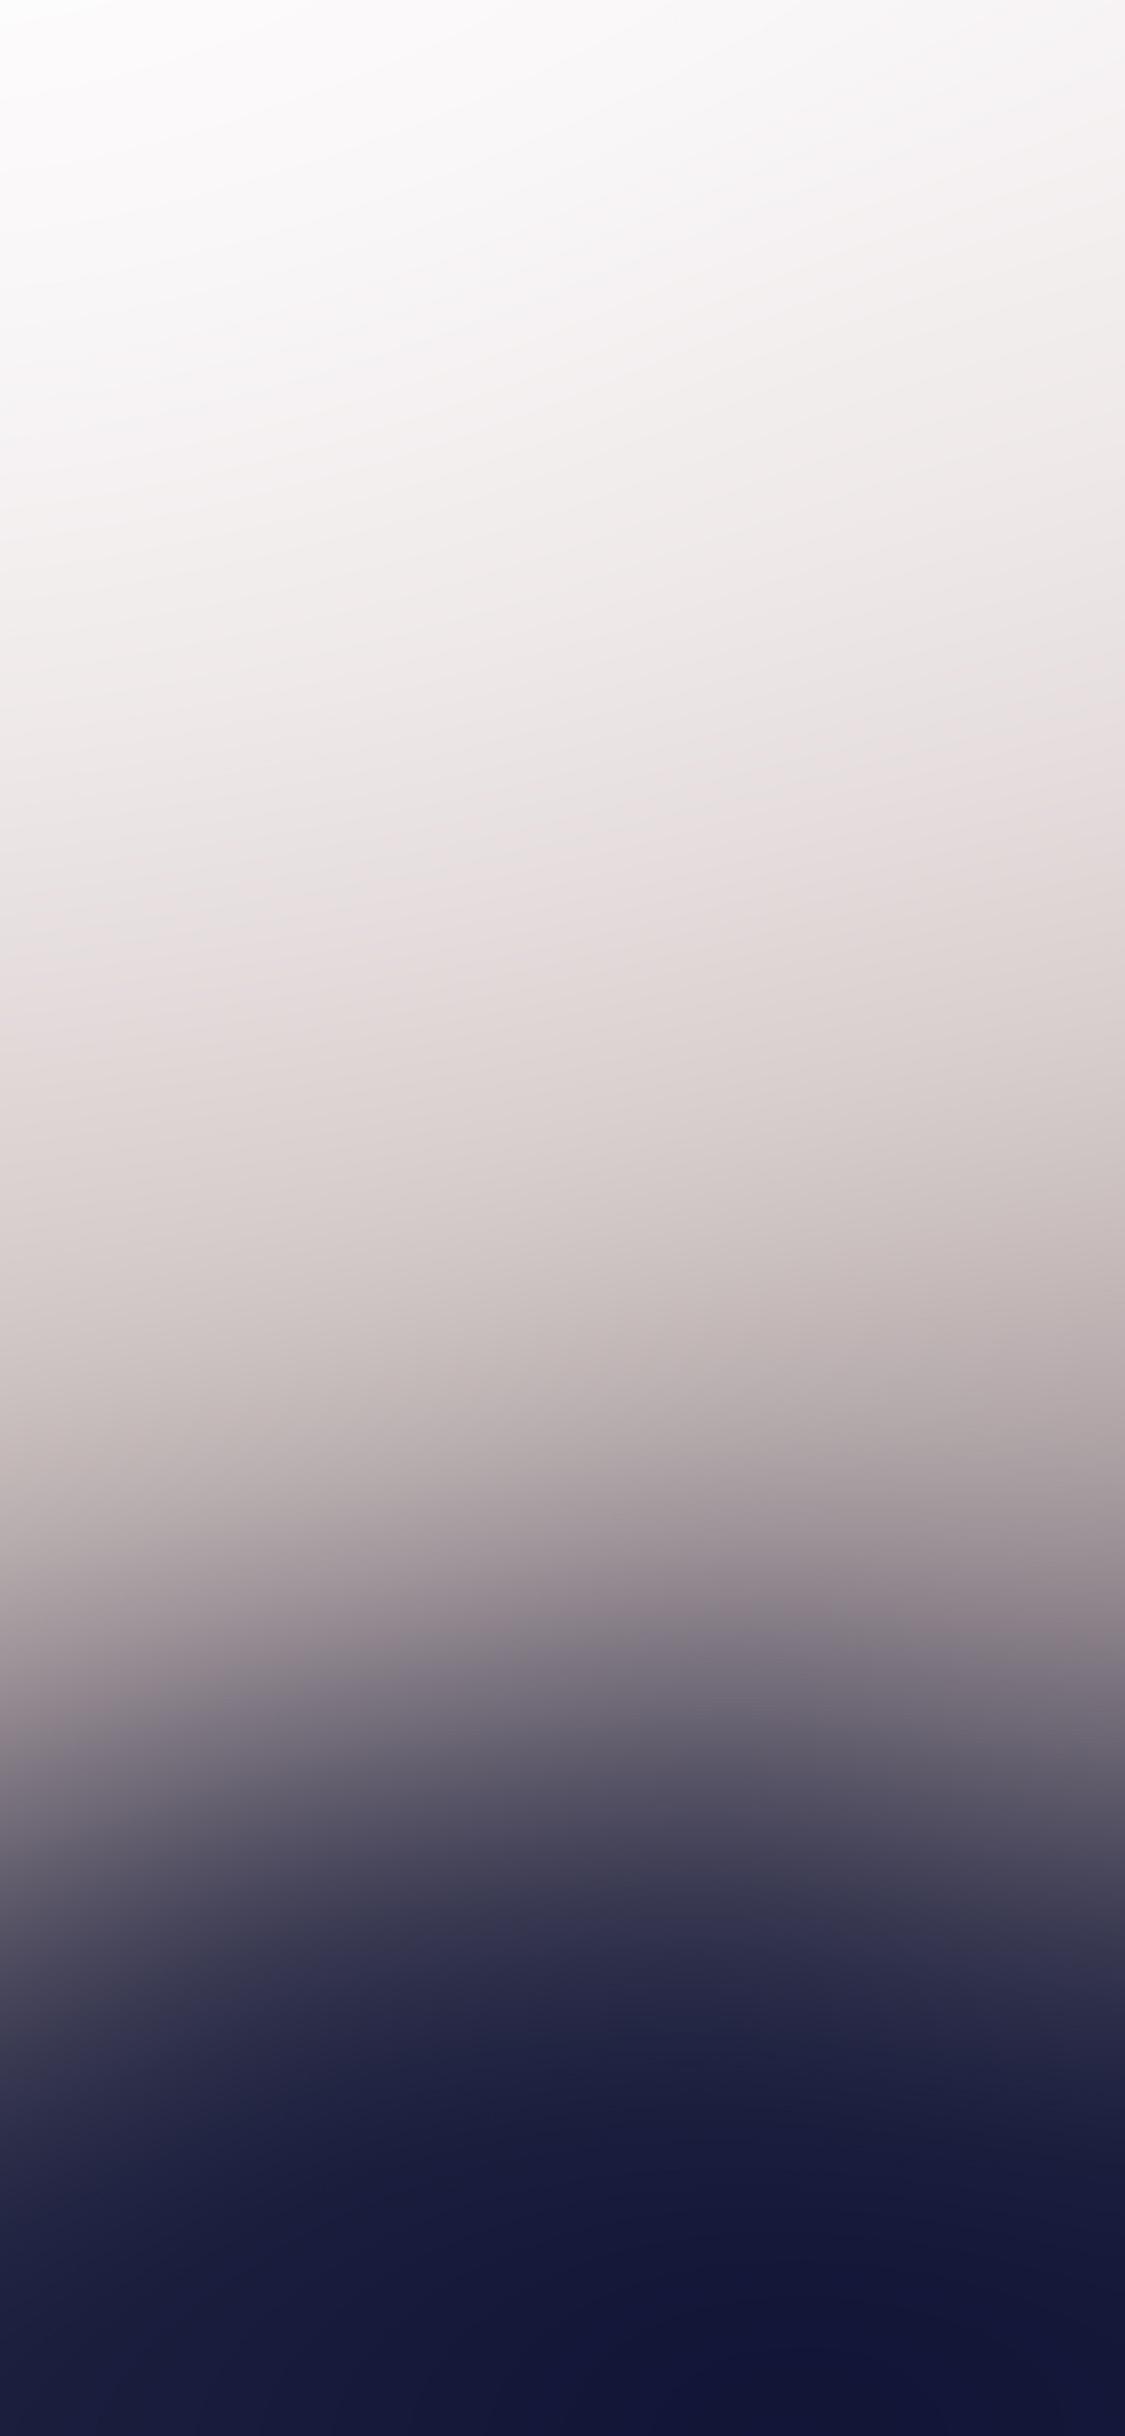 iPhoneXpapers.com-Apple-iPhone-wallpaper-sk72-fog-morning-blue-blur-gradation